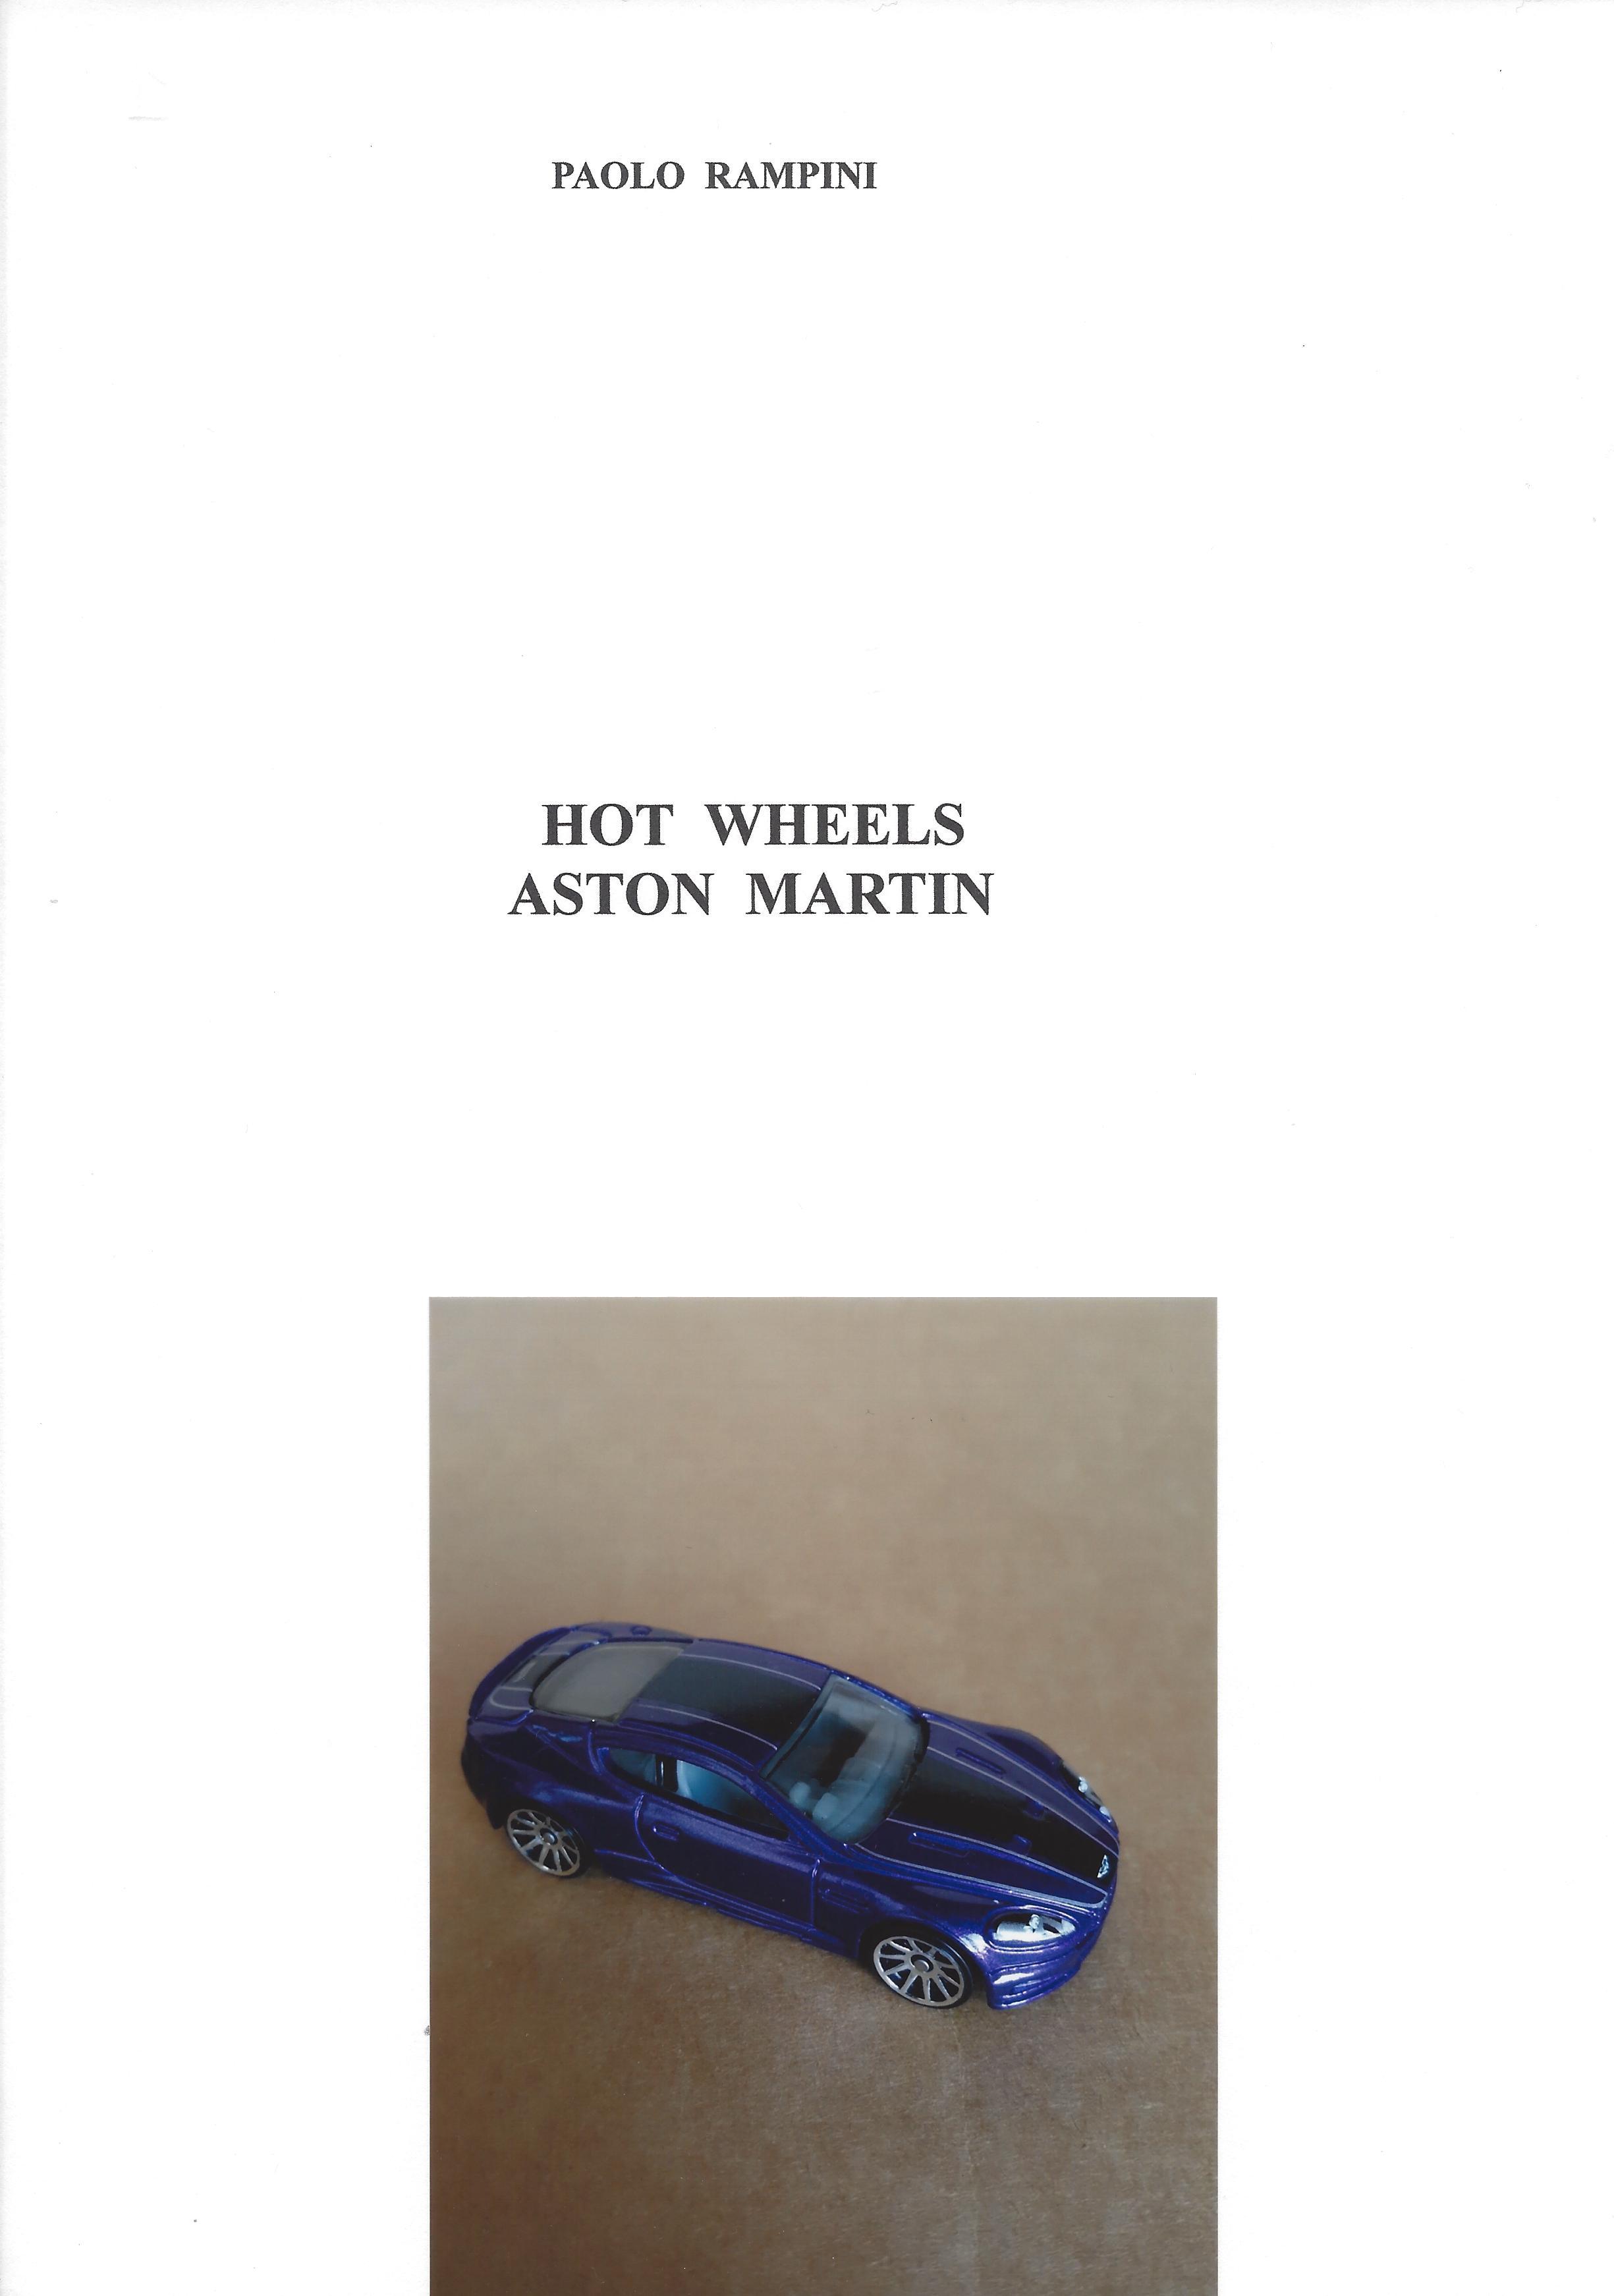 HOT WHEELS ASTON MARTIN, Paolo Rampini, 2018